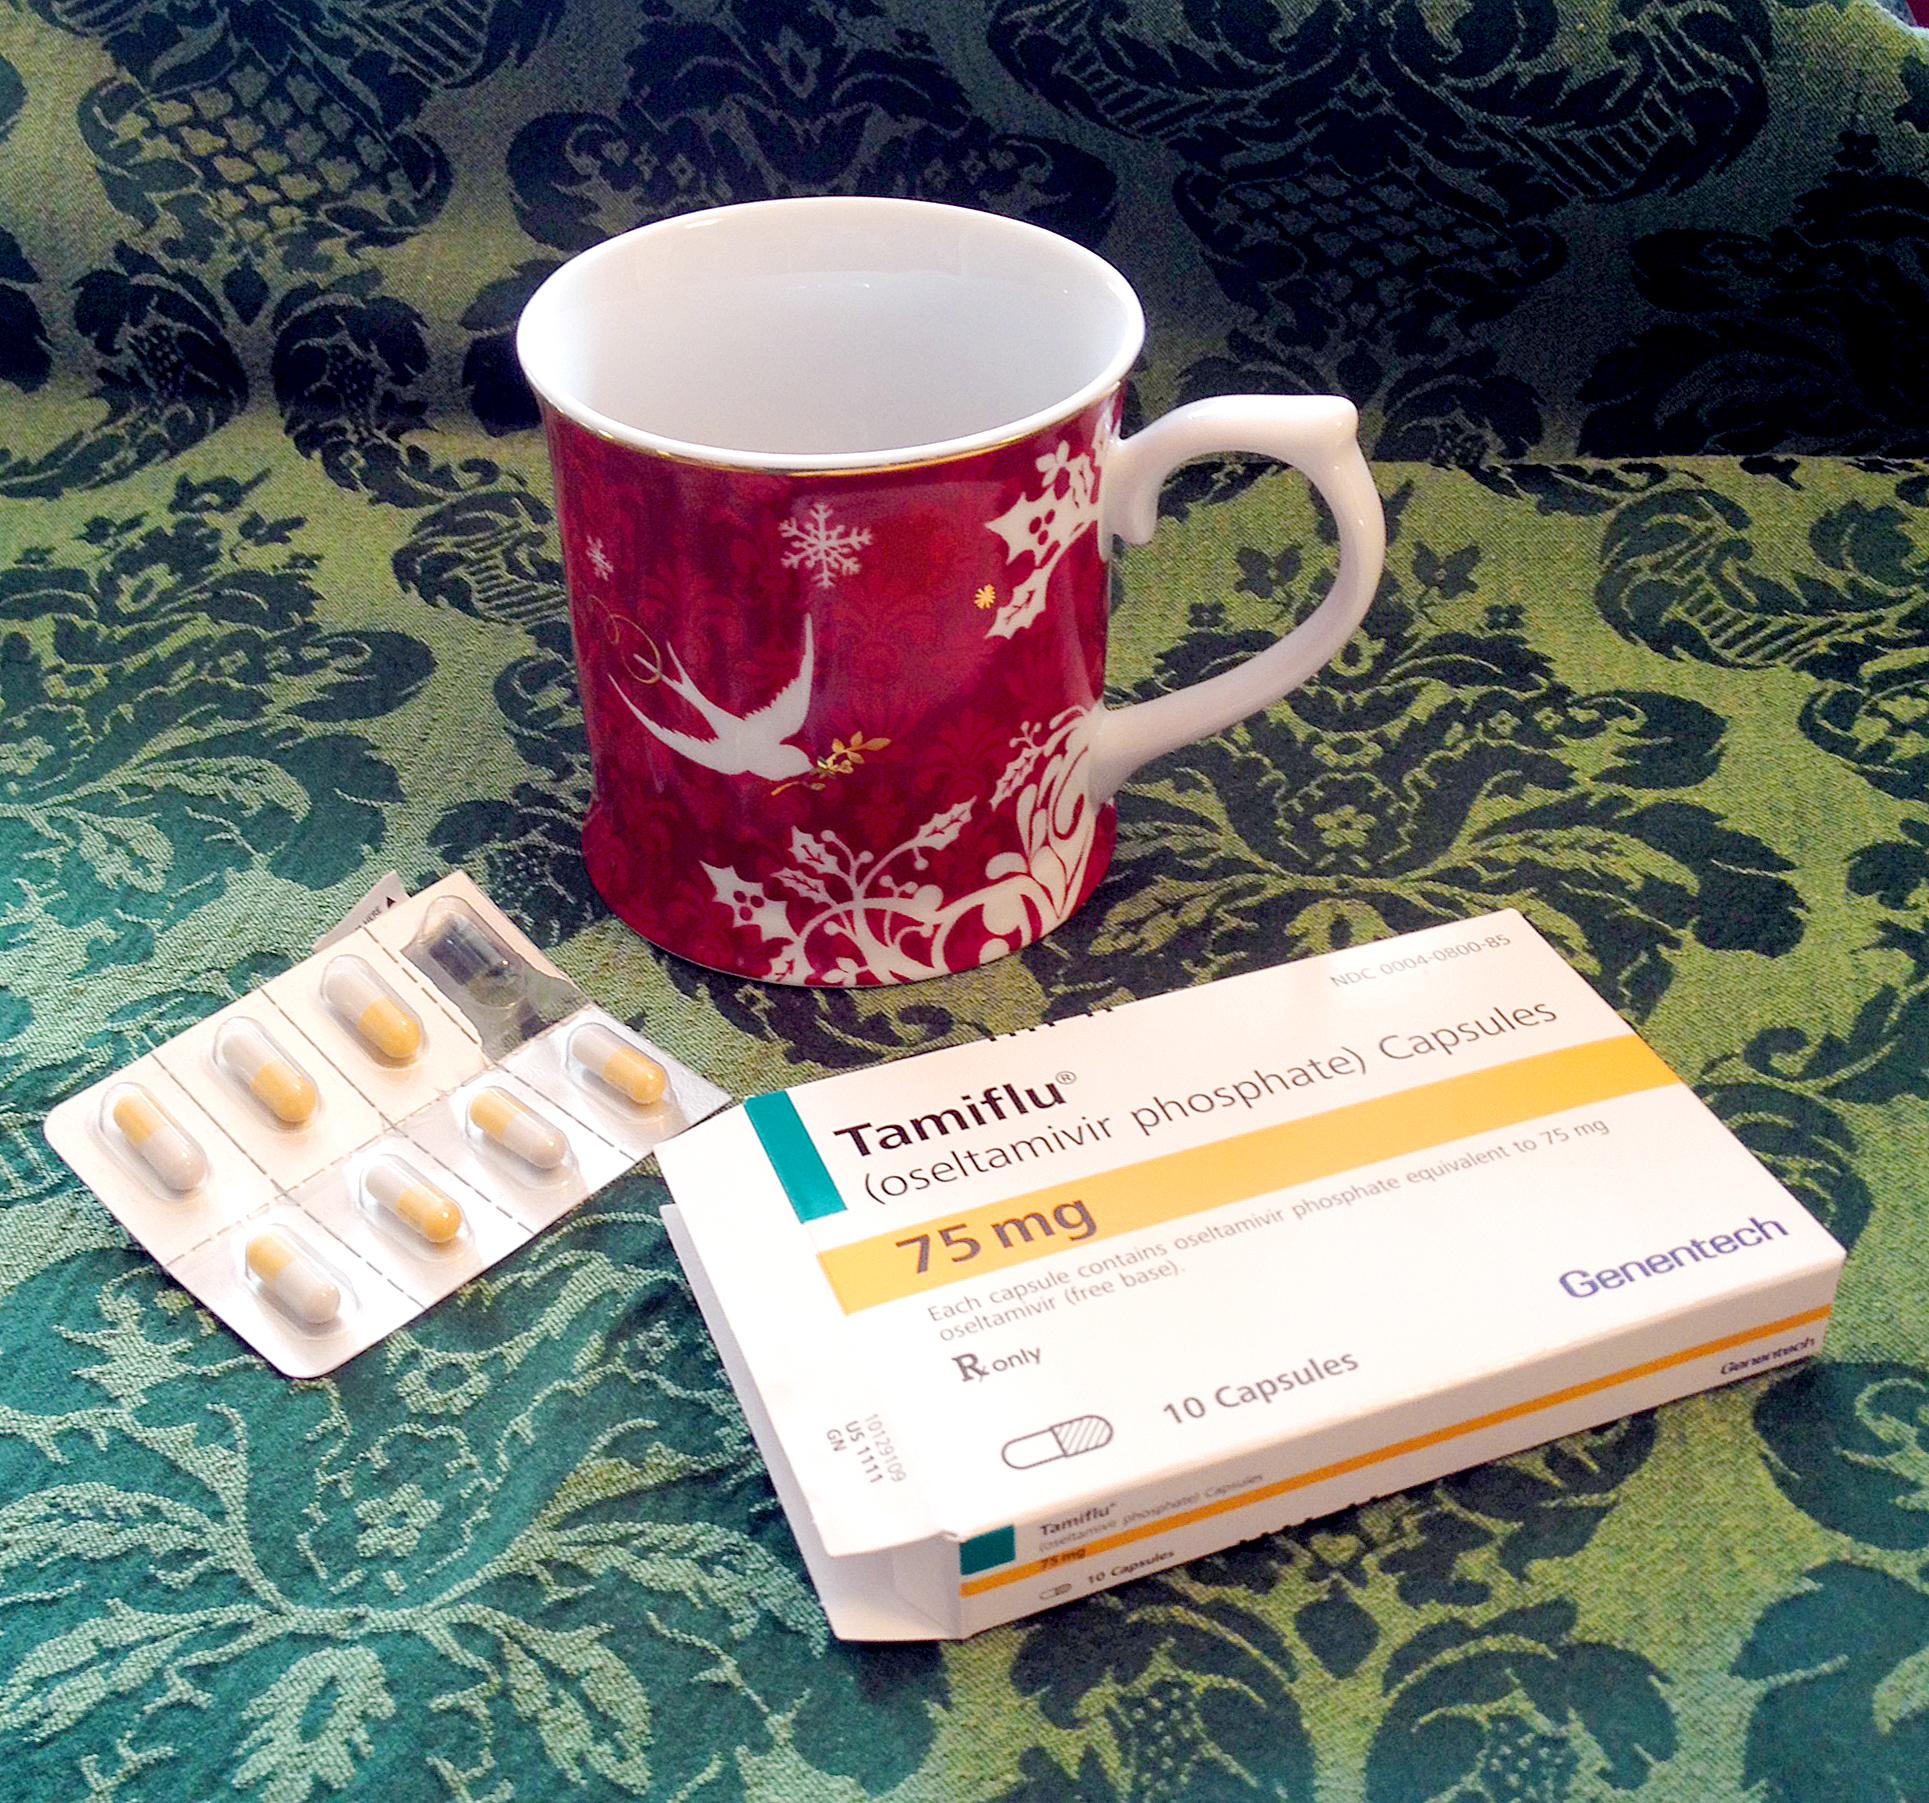 Tea & Tamiflu